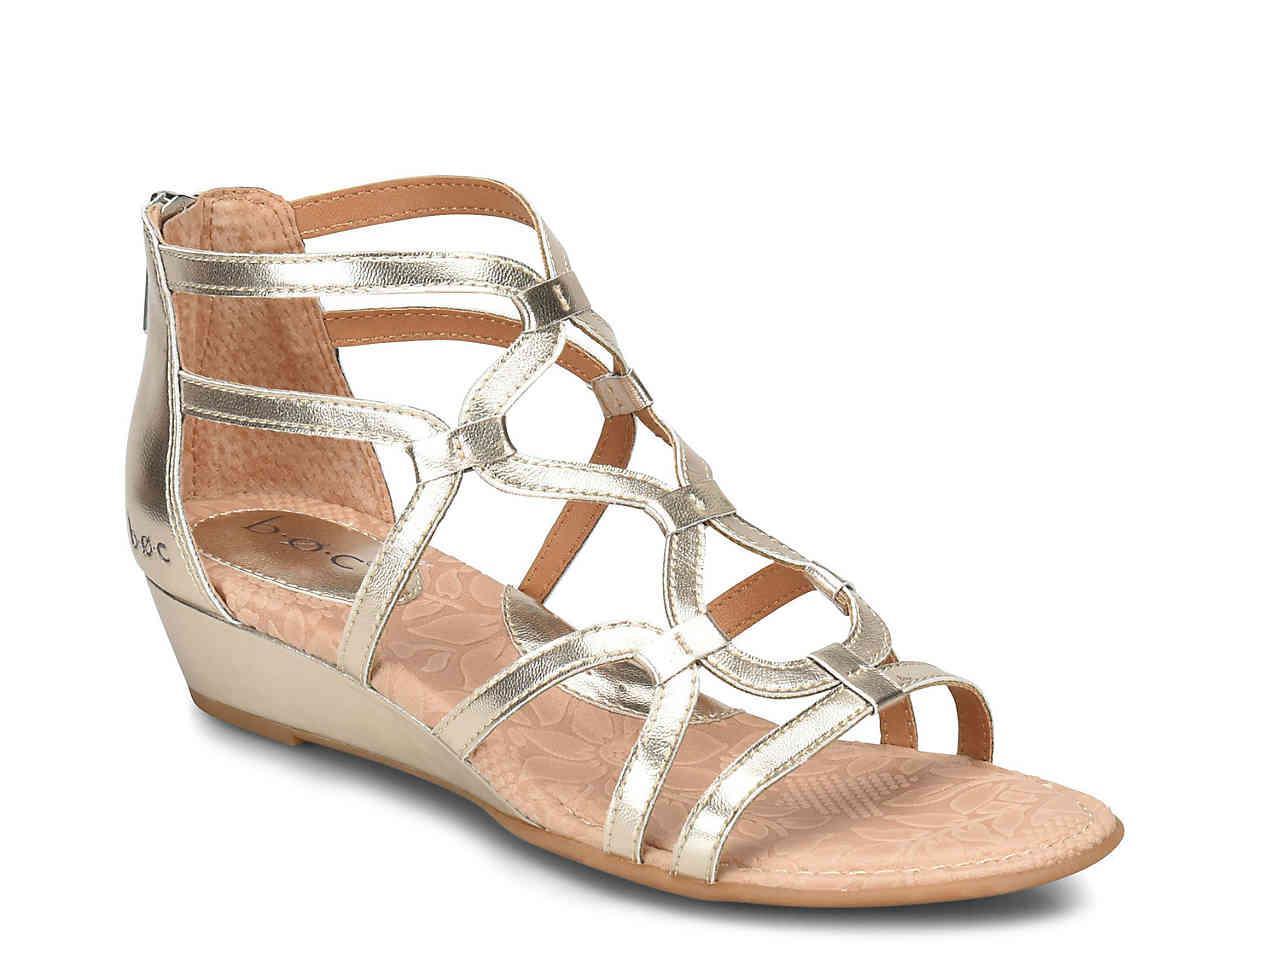 3f5e3504c691 Metallic Pawel Wedge Gladiator Sandal - Lyst. View fullscreen